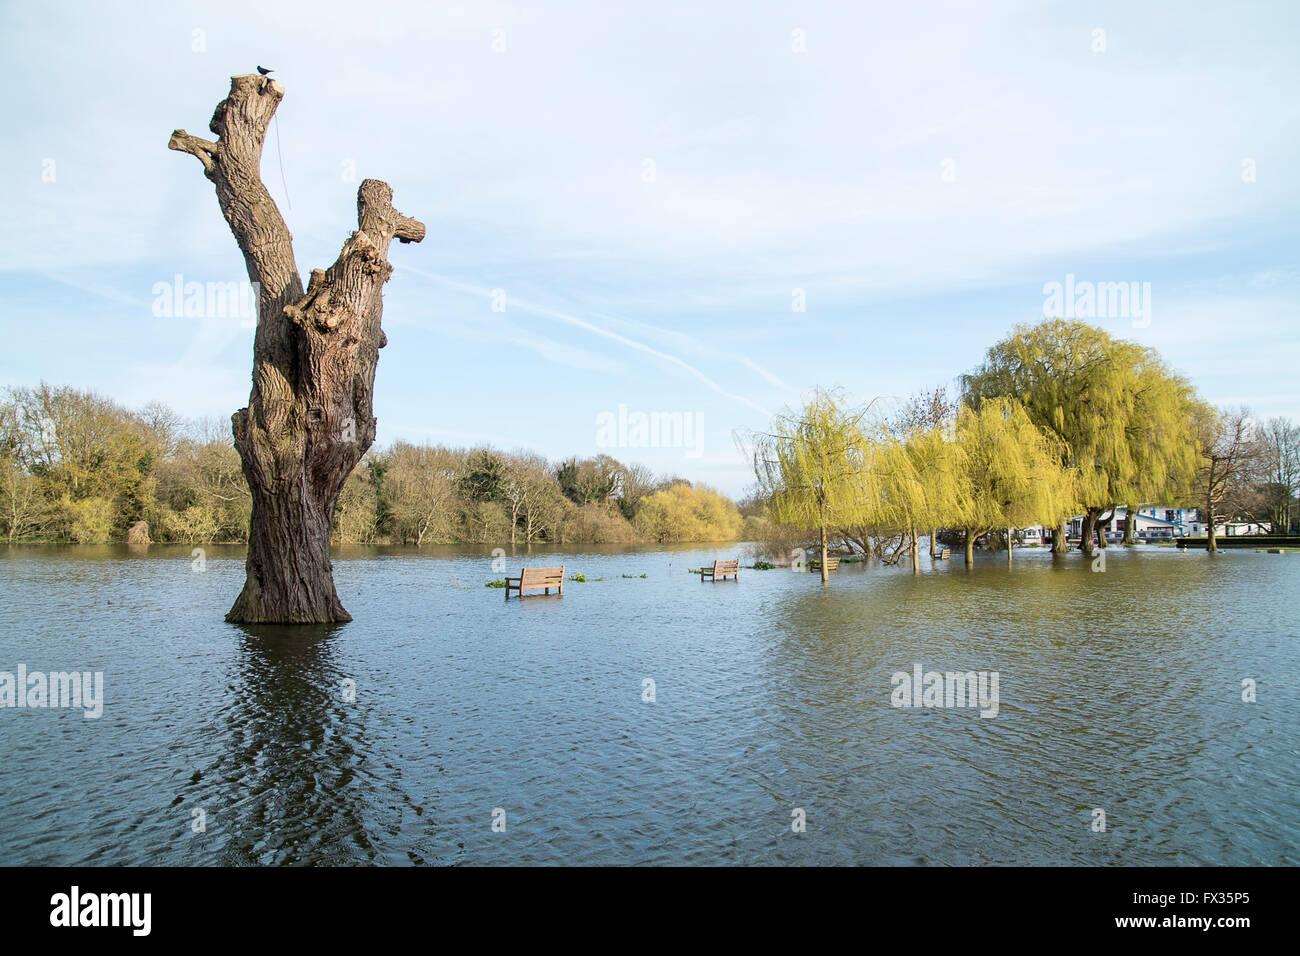 High Tide in Radnor Gardens Twickenham - Stock Image